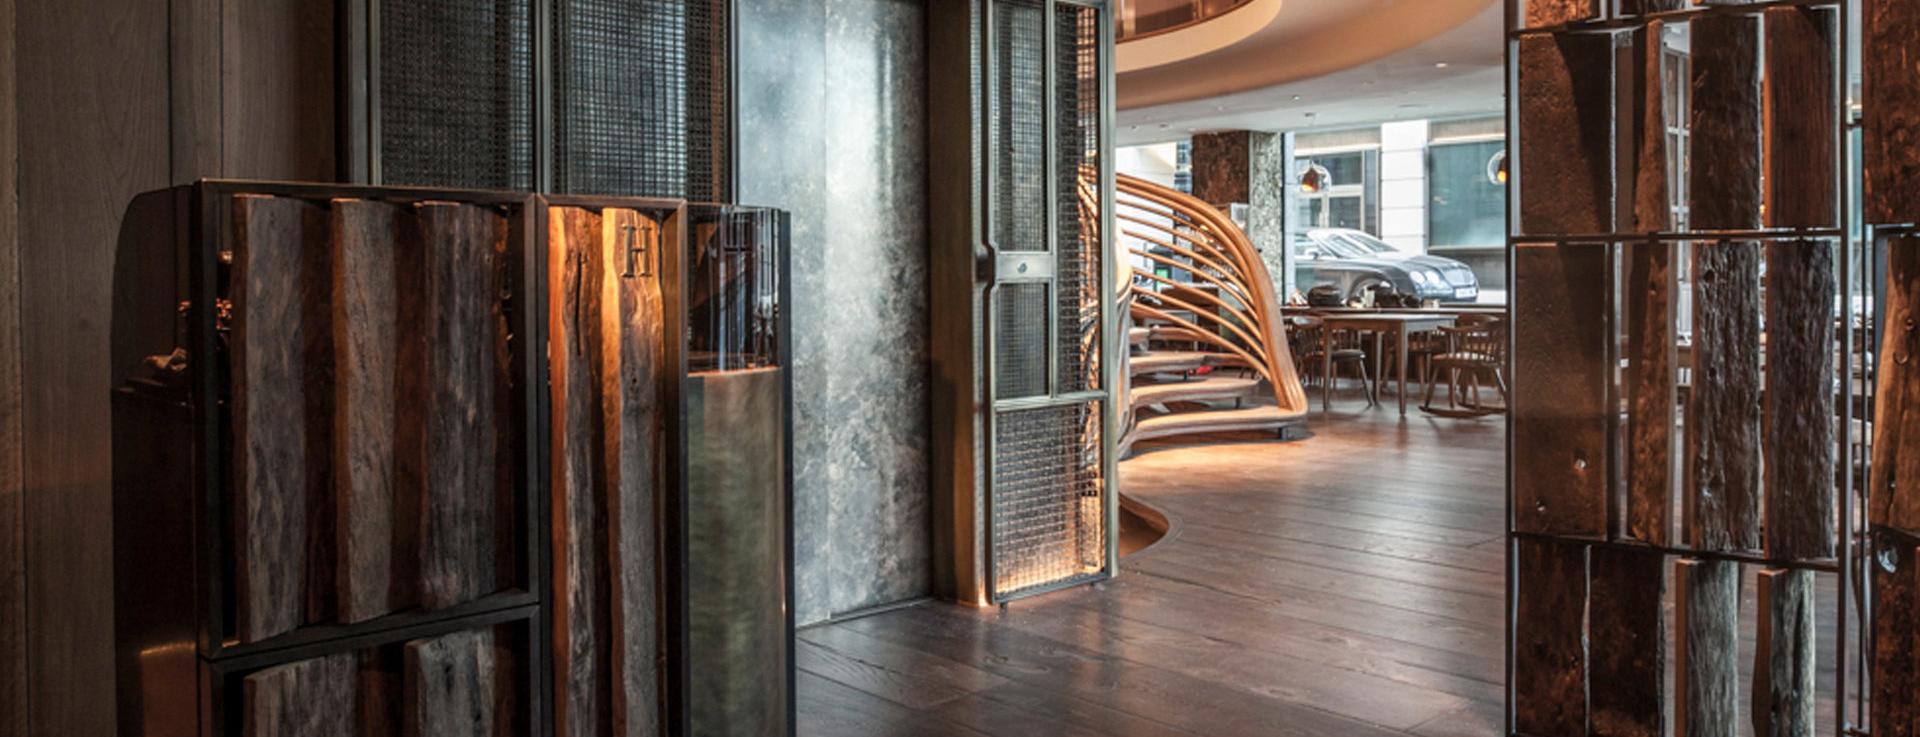 Hide-Restaurant-Interior-reception-screen-craignarramore copy